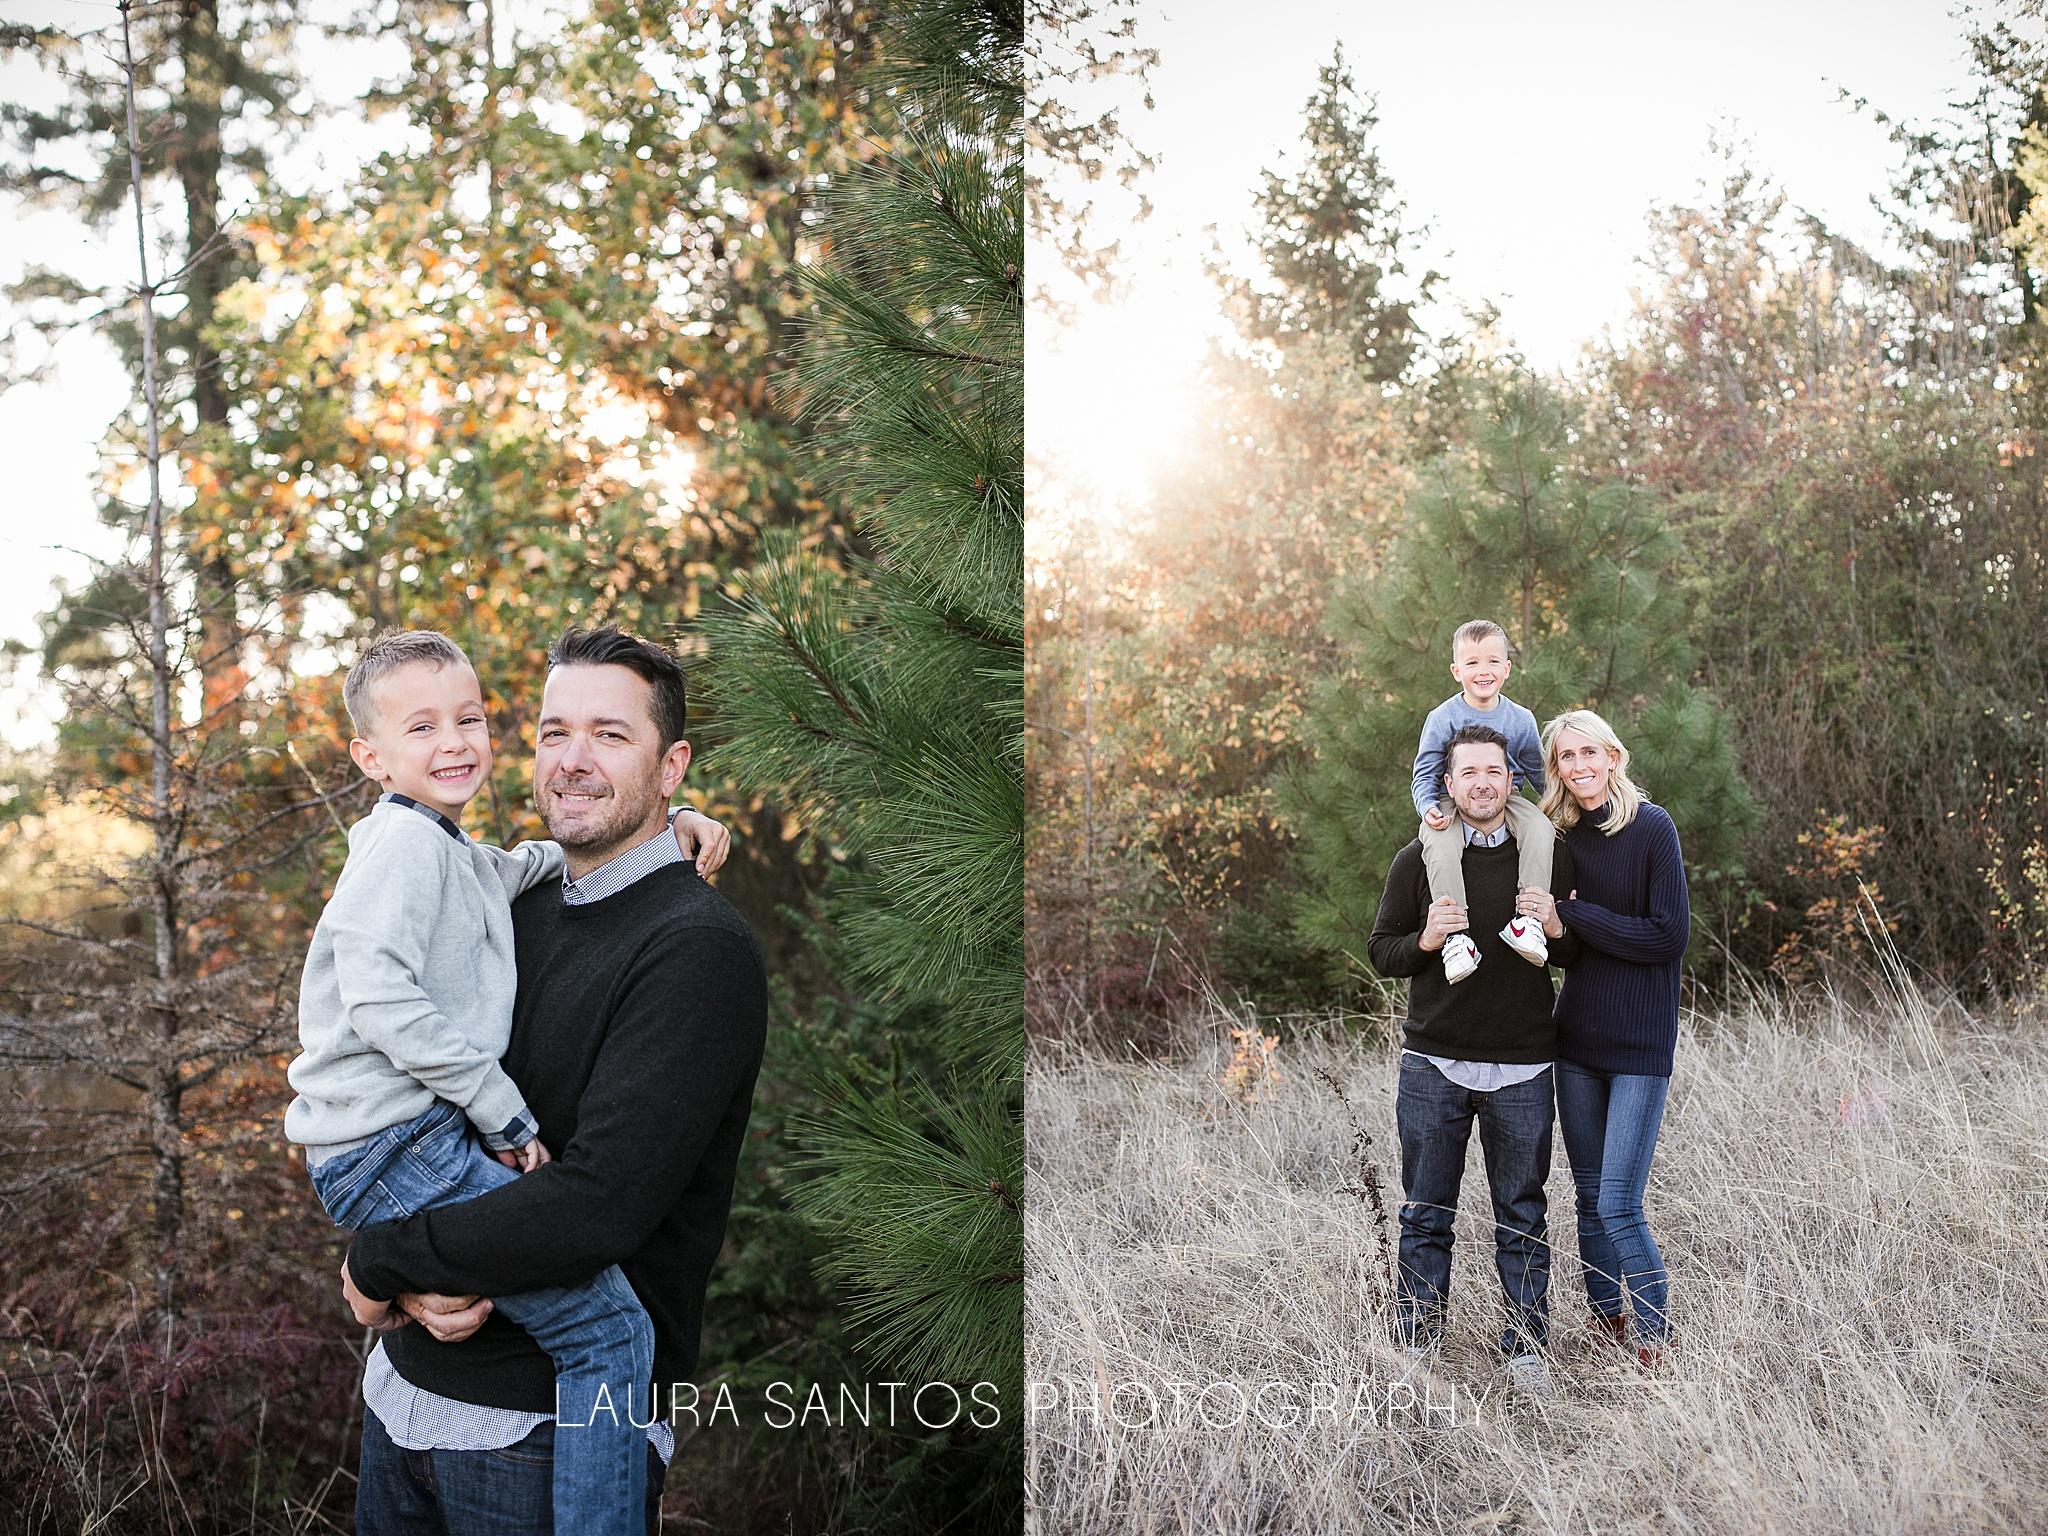 Laura Santos Photography Portland Oregon Family Photographer_0825.jpg